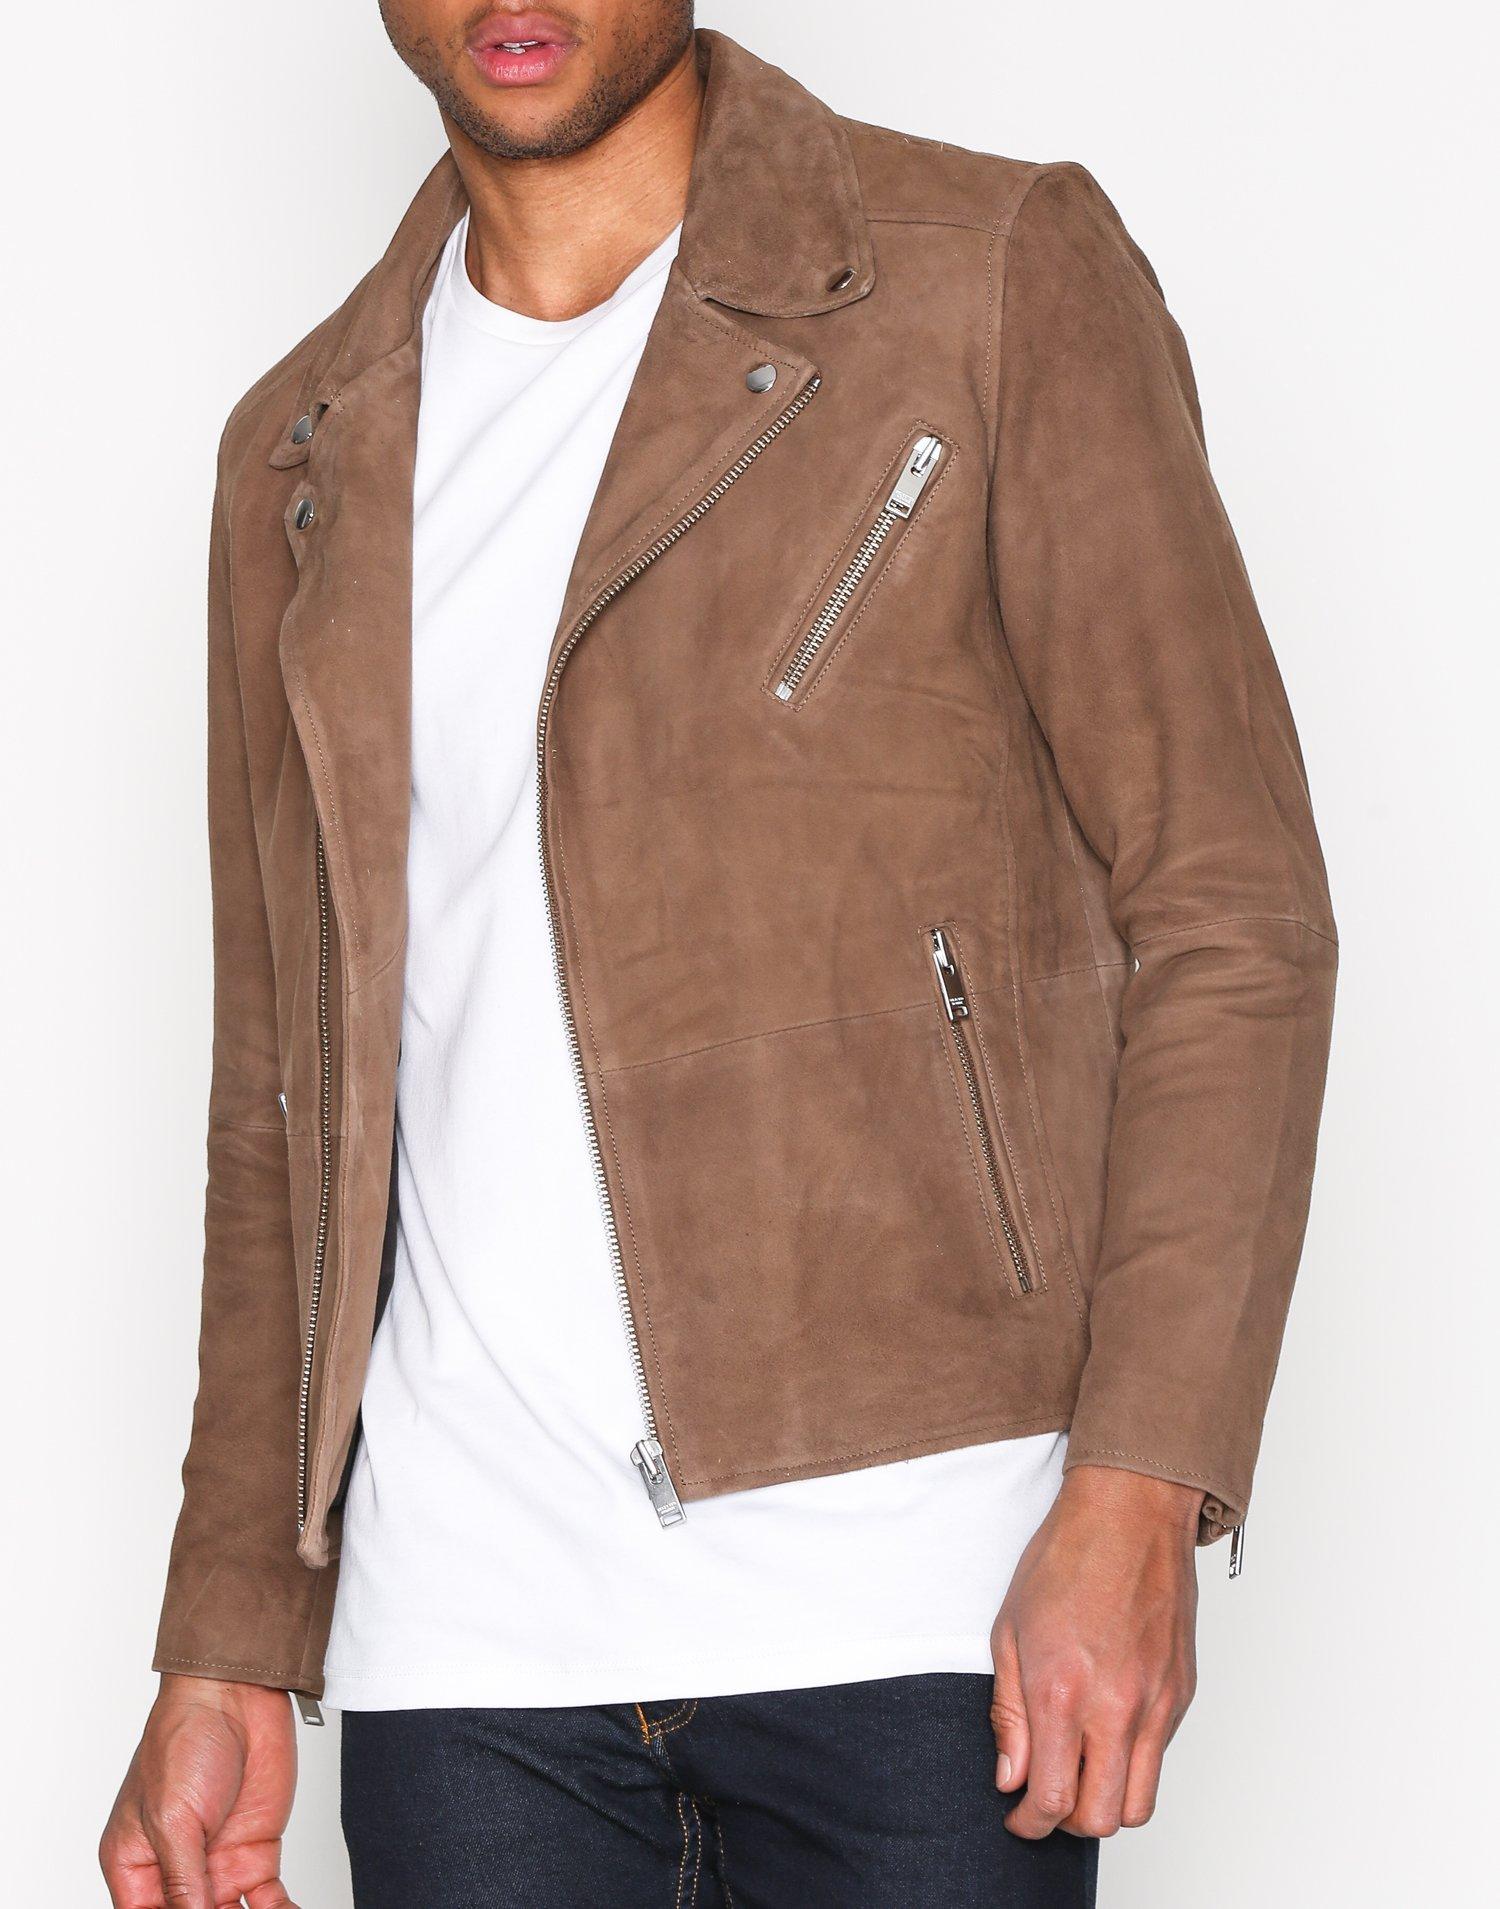 0c0c4c0908a02 Shnscott suede biker jacket selected homme dark brown jackets jpg 934x1244 Suede  biker jacket